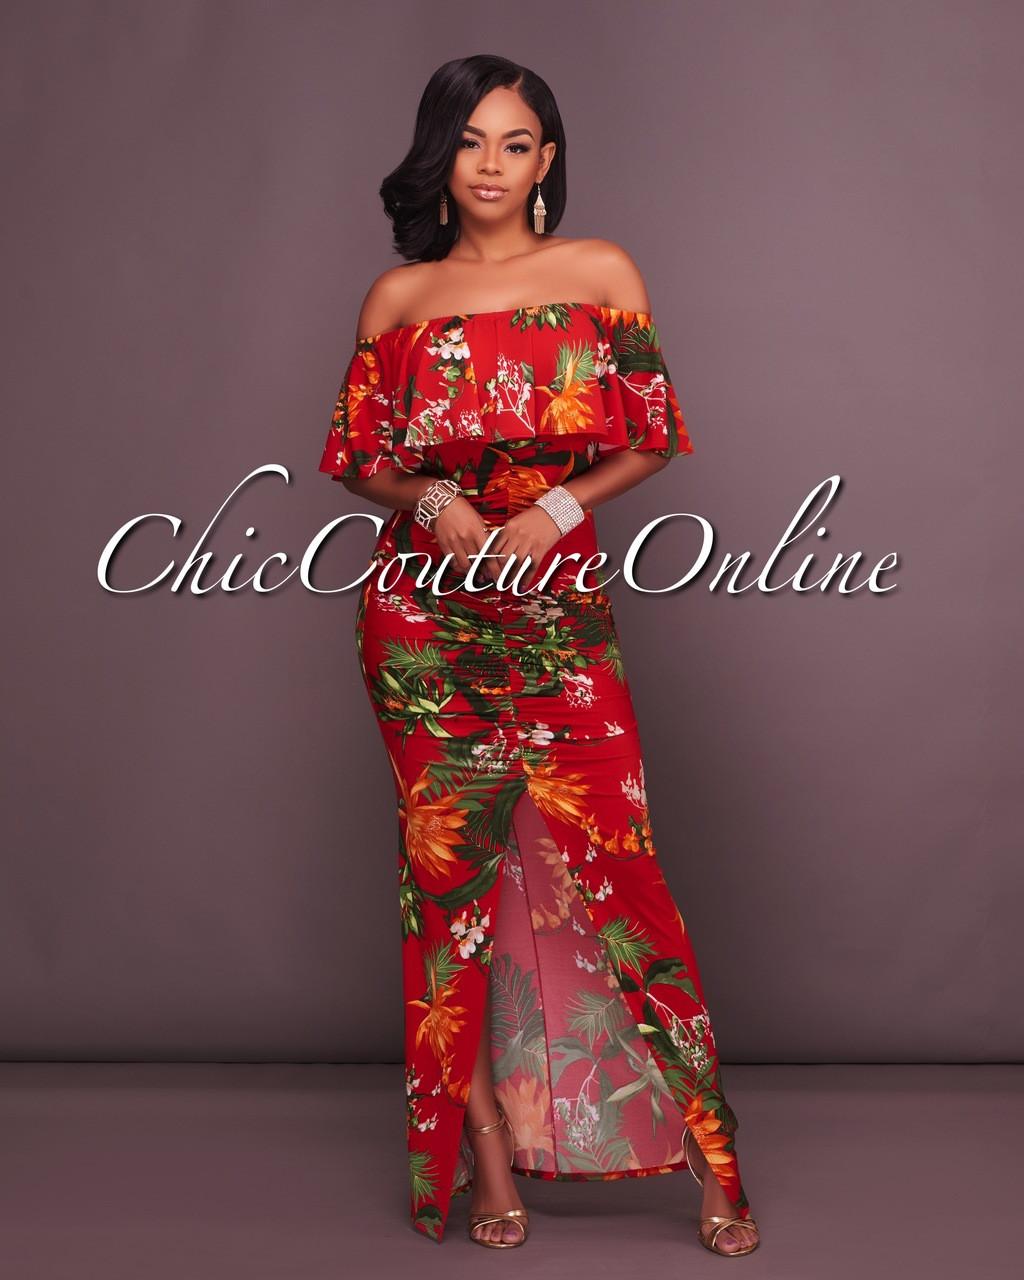 8d244216e9c1 Francoise Red Multi-Color Floral Print Off-The-Shoulder Maxi Dress. Price    45.00. Image 1